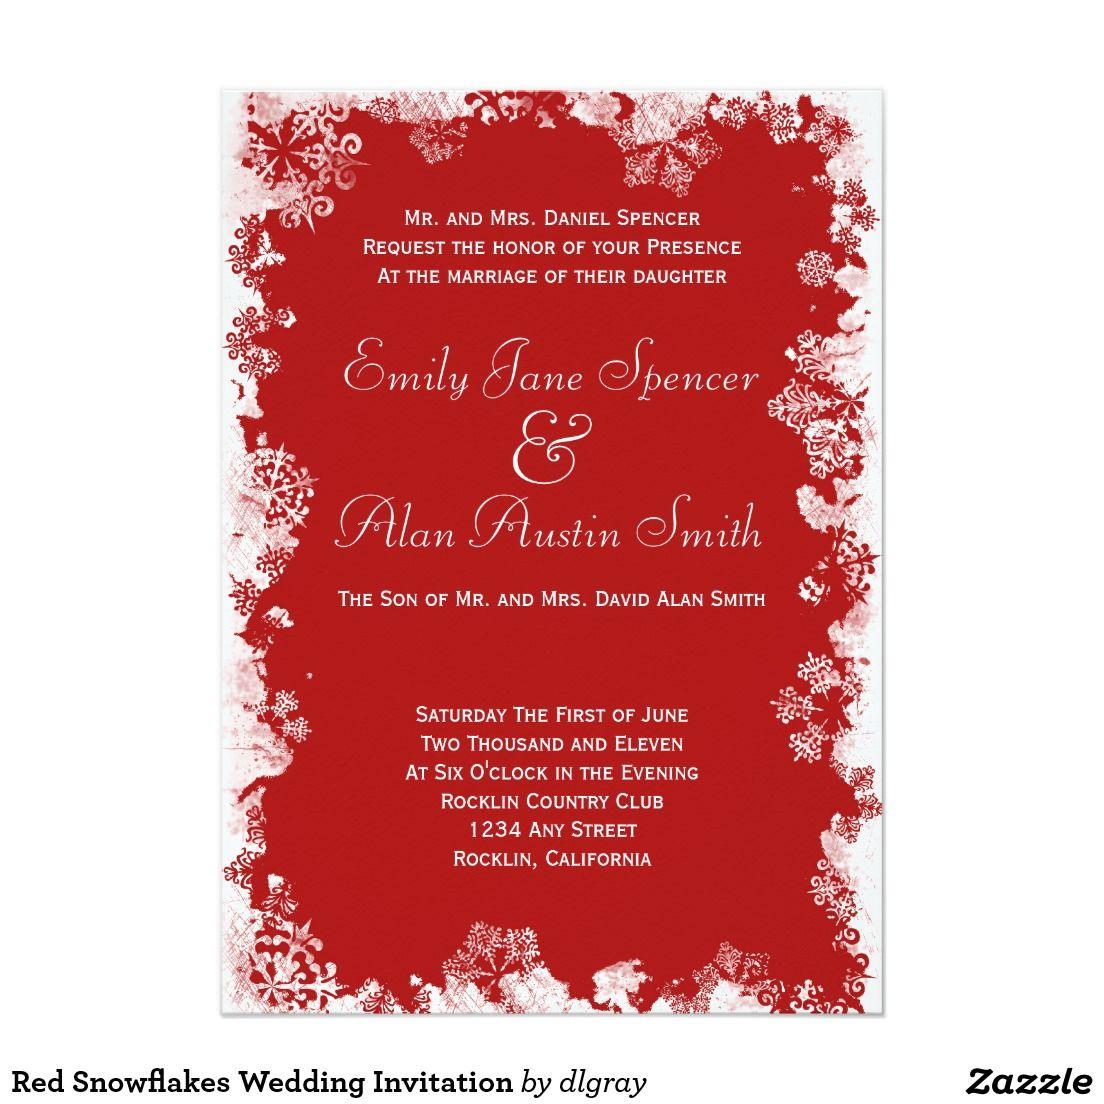 Red Snowflakes Wedding Invitation | Wedding: Winter Invitations ...